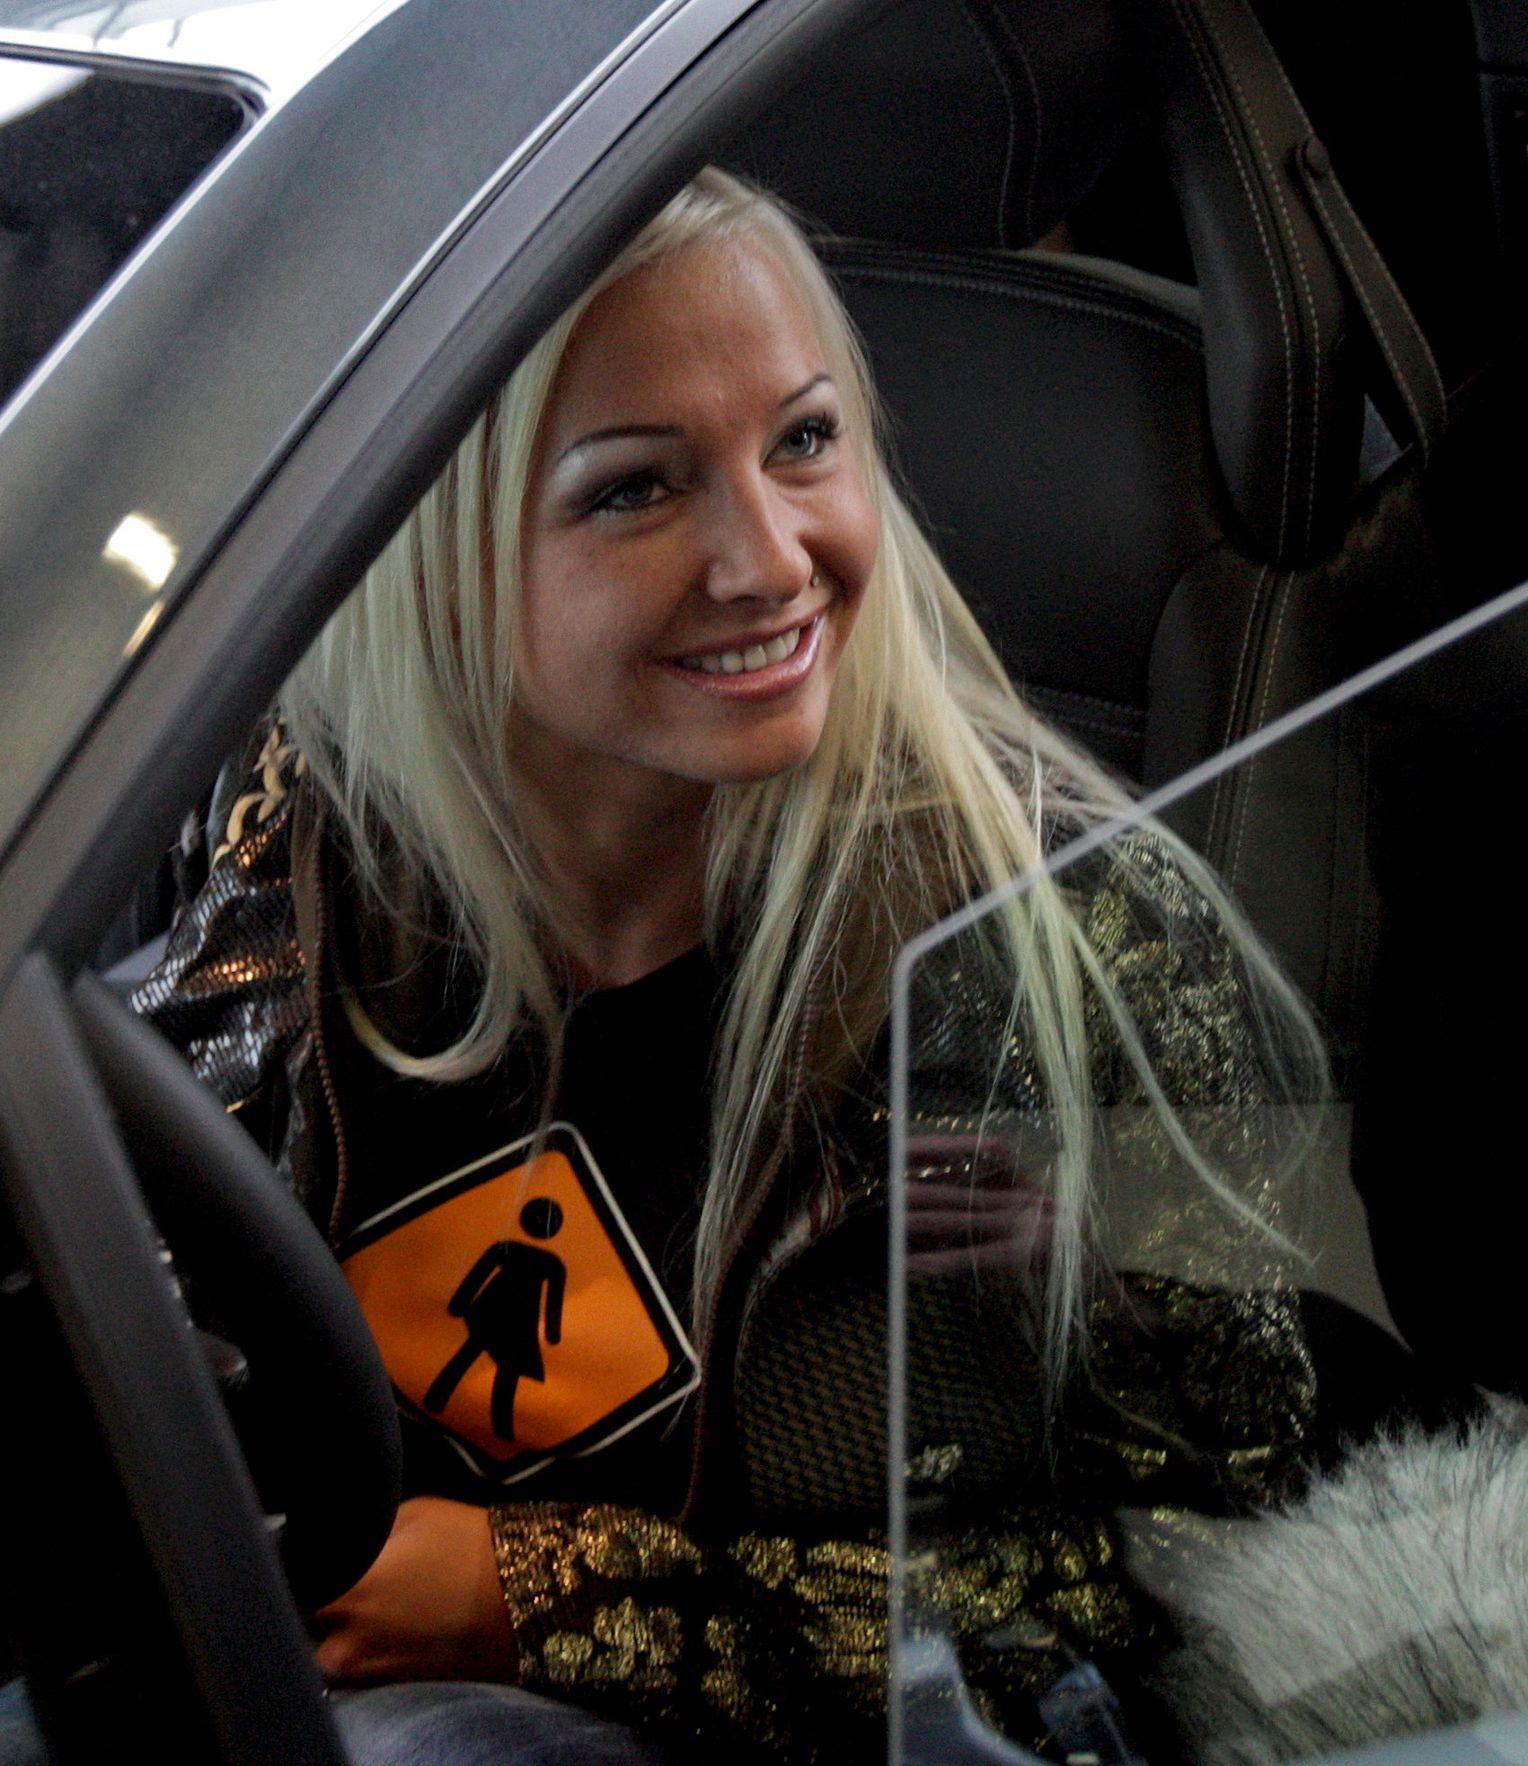 Hambuger Polizist fickt Sexy Cora durch